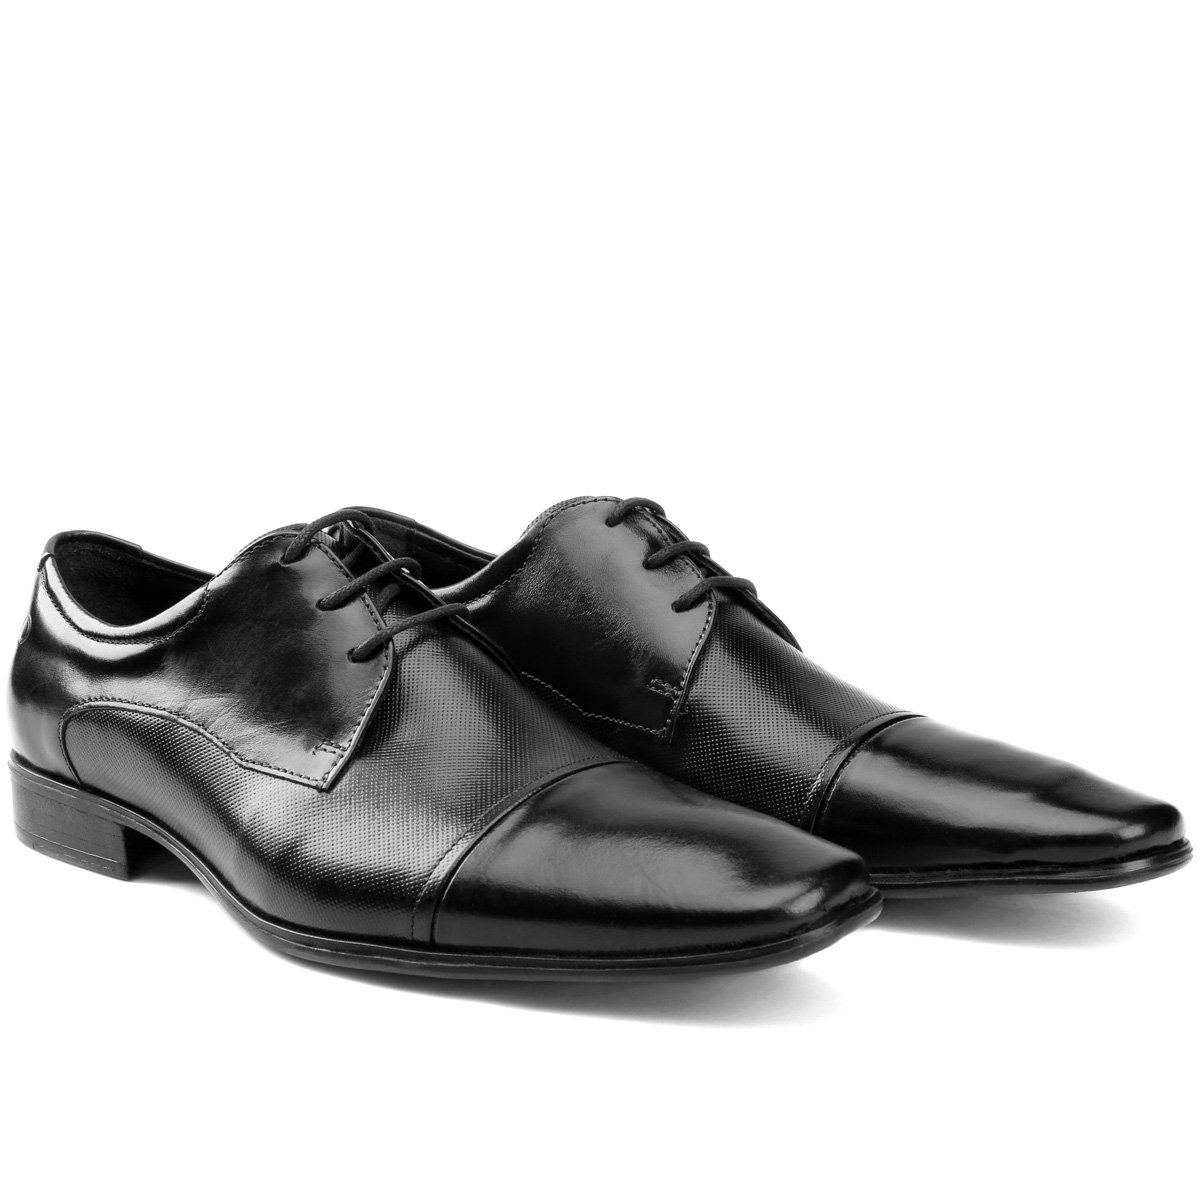 a8587e7f2 Sapato Social Couro Democrata Still - Compre Agora